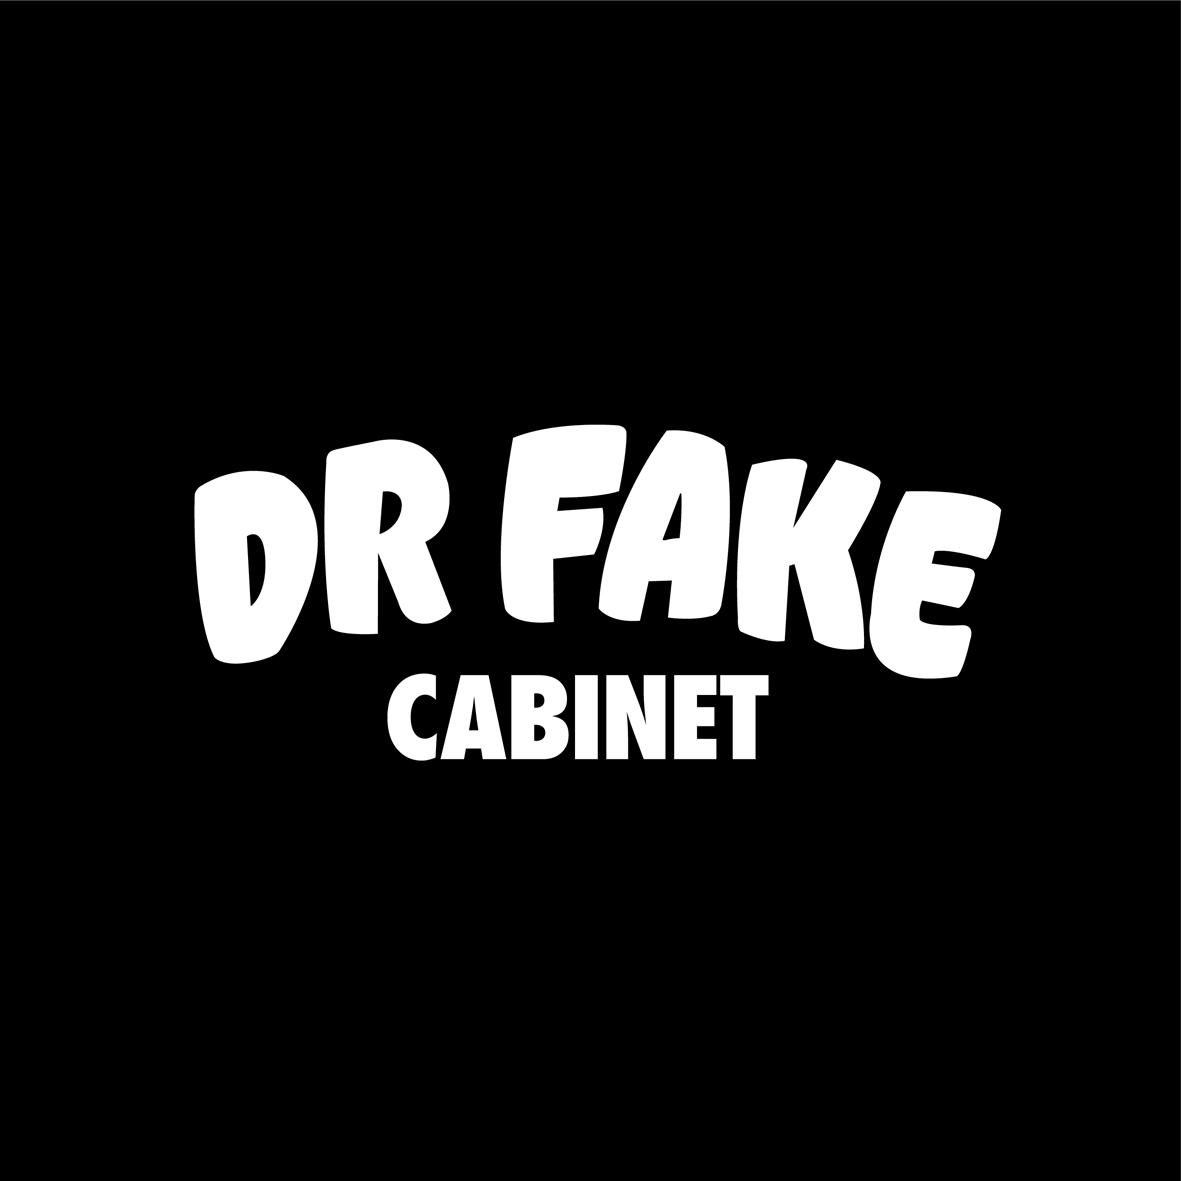 DR FAKE CABINET